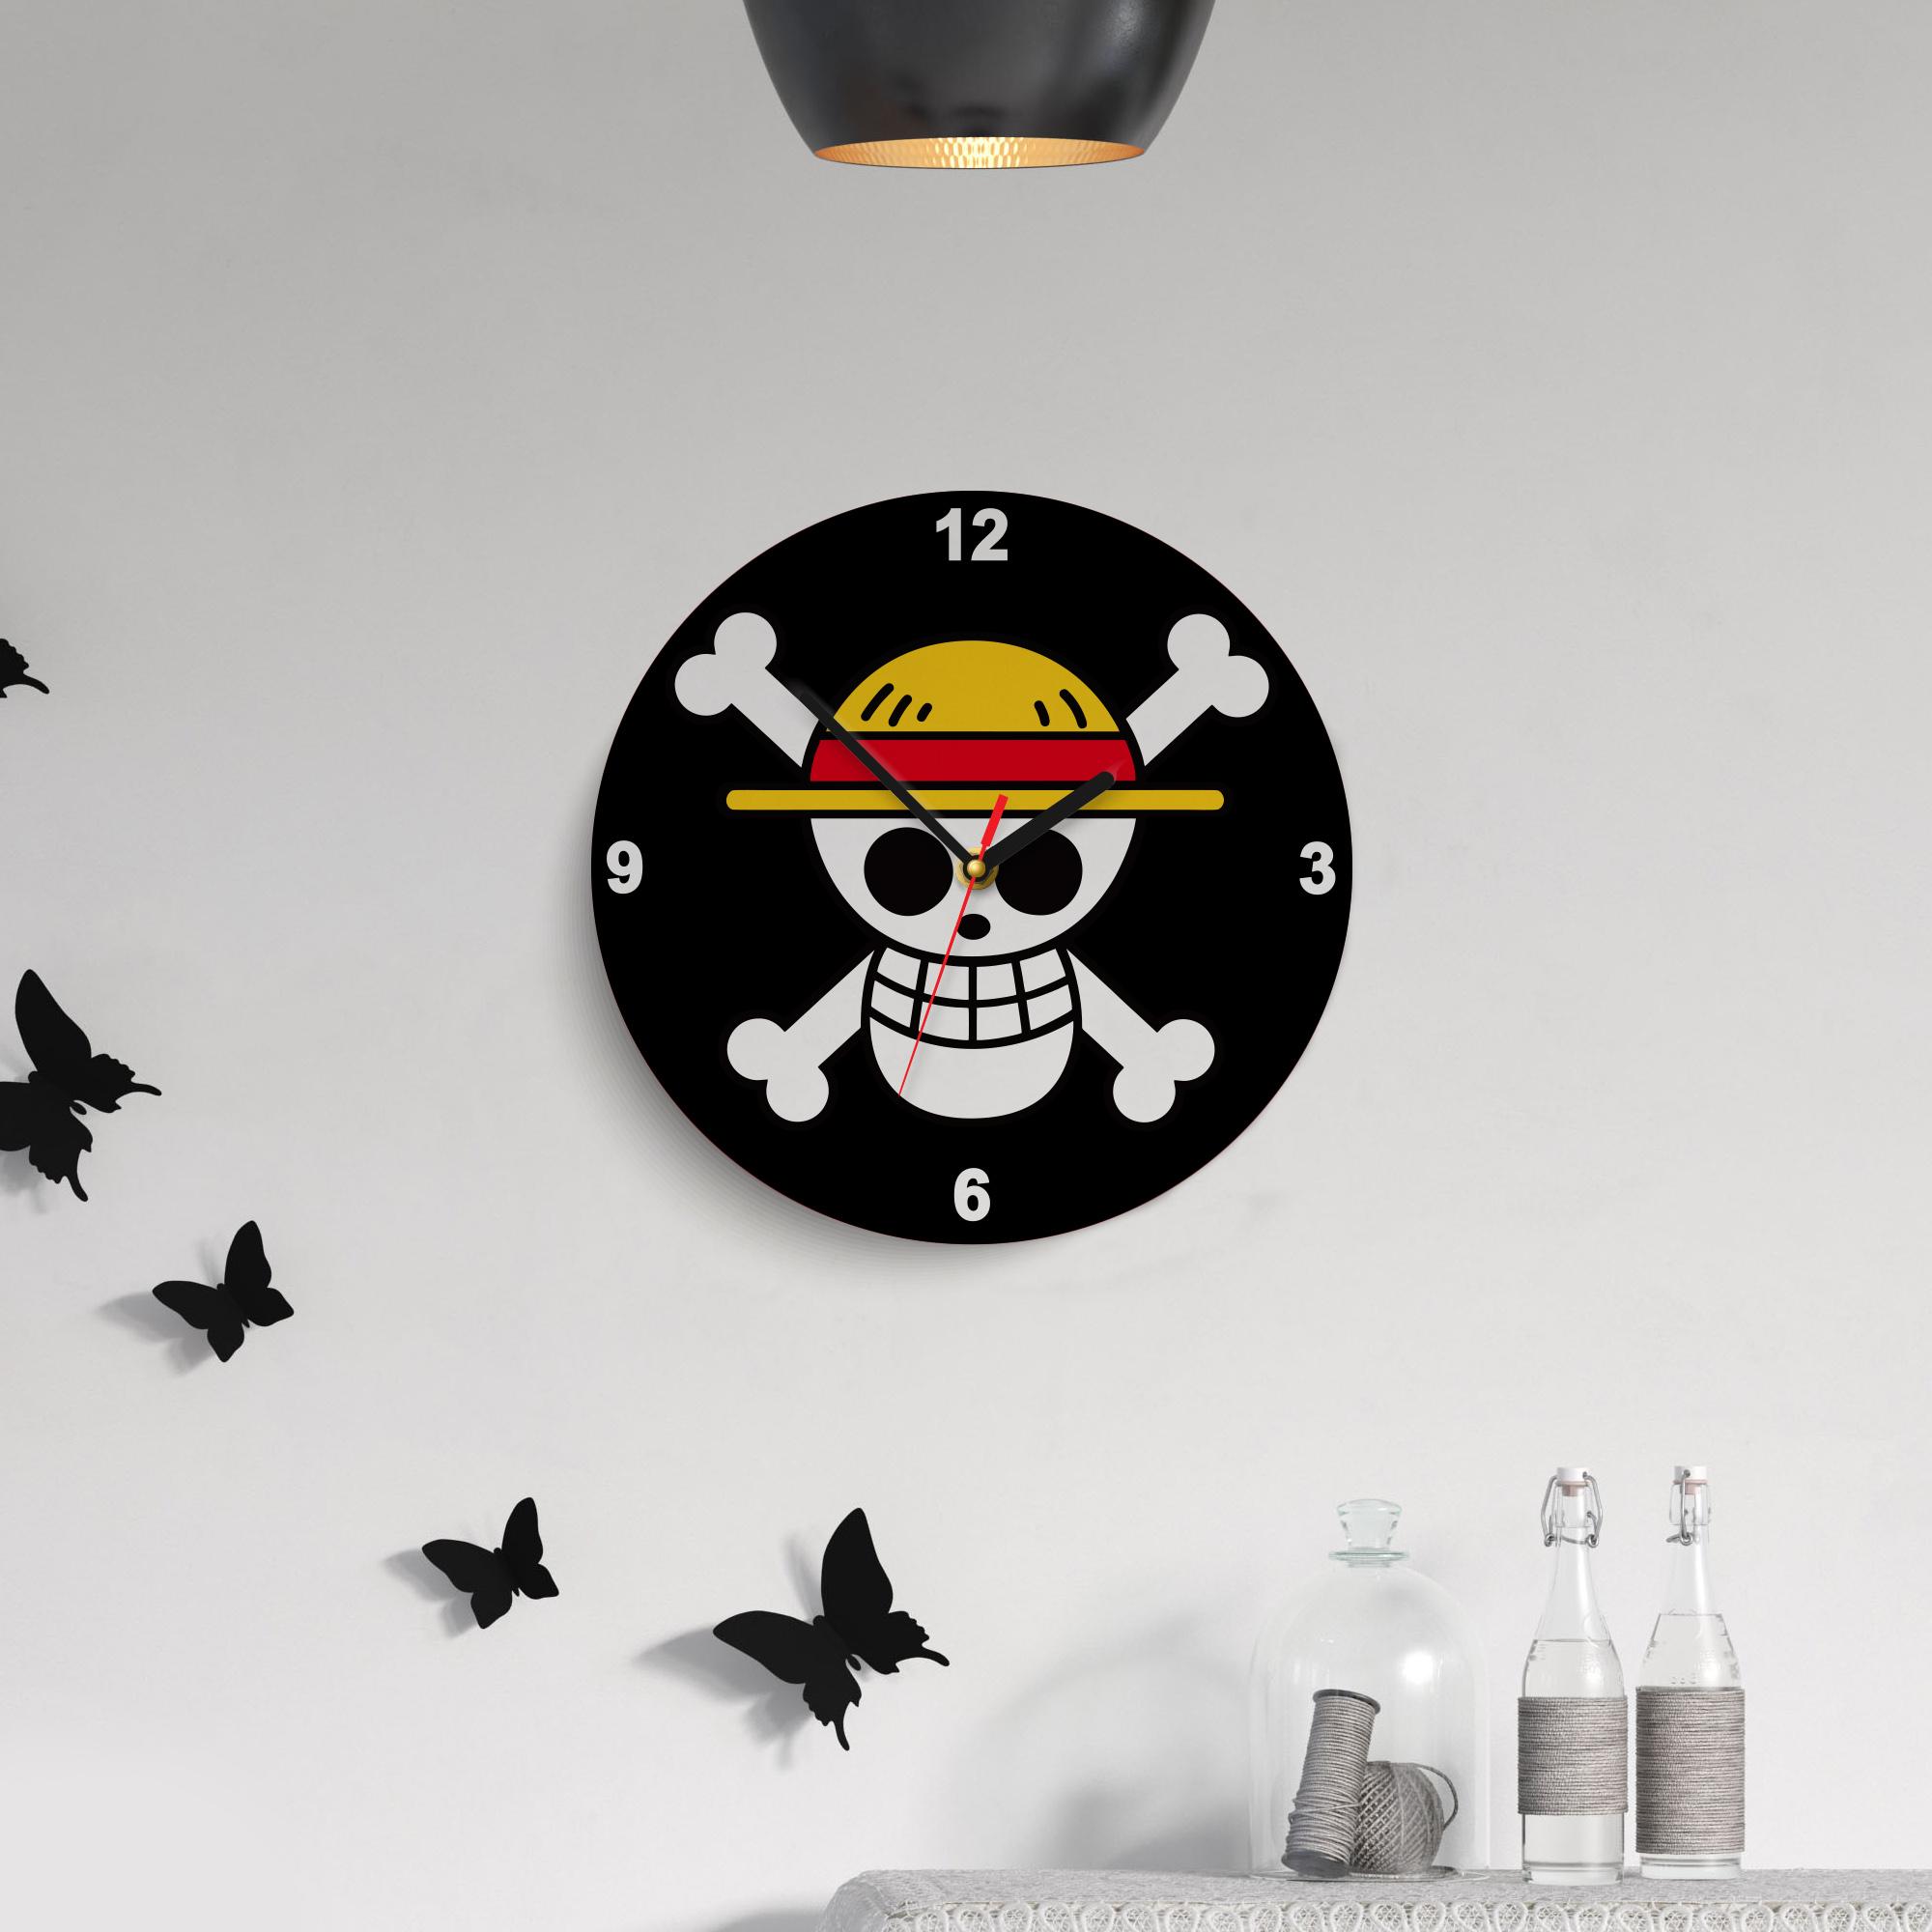 jam dinding anime one piece thoussunny unik menarik cocok untuk hiasan dinding diameter 30cm